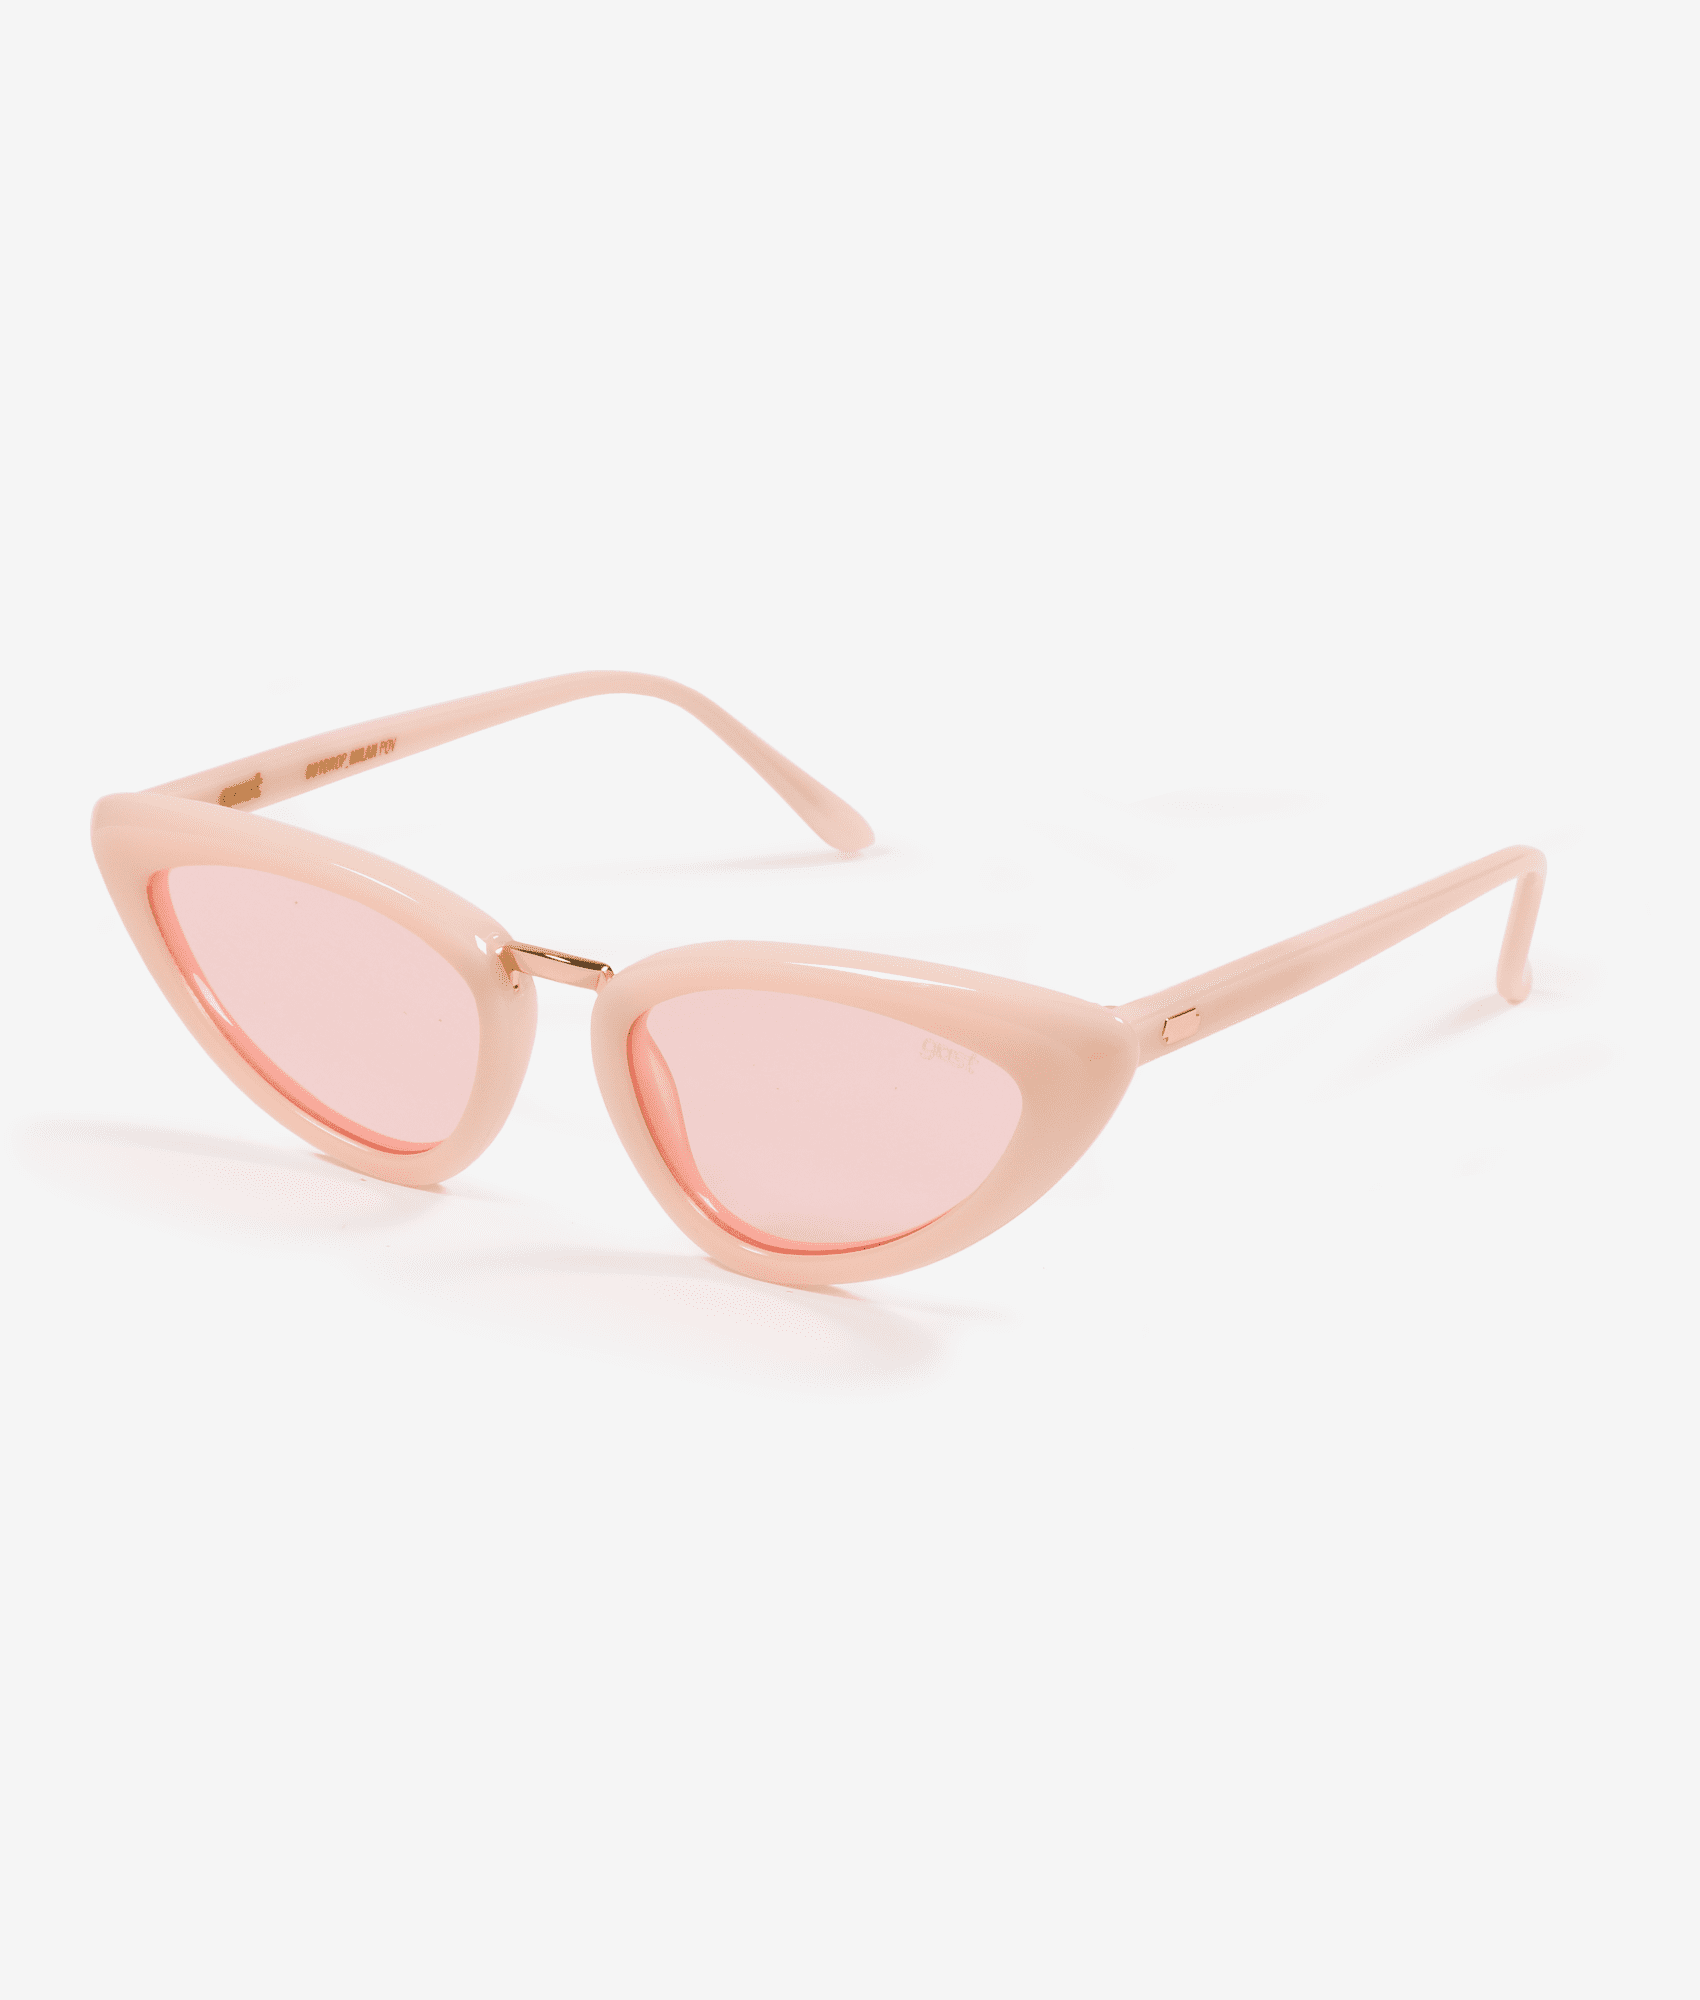 VENTI 144 Gast Sunglasses